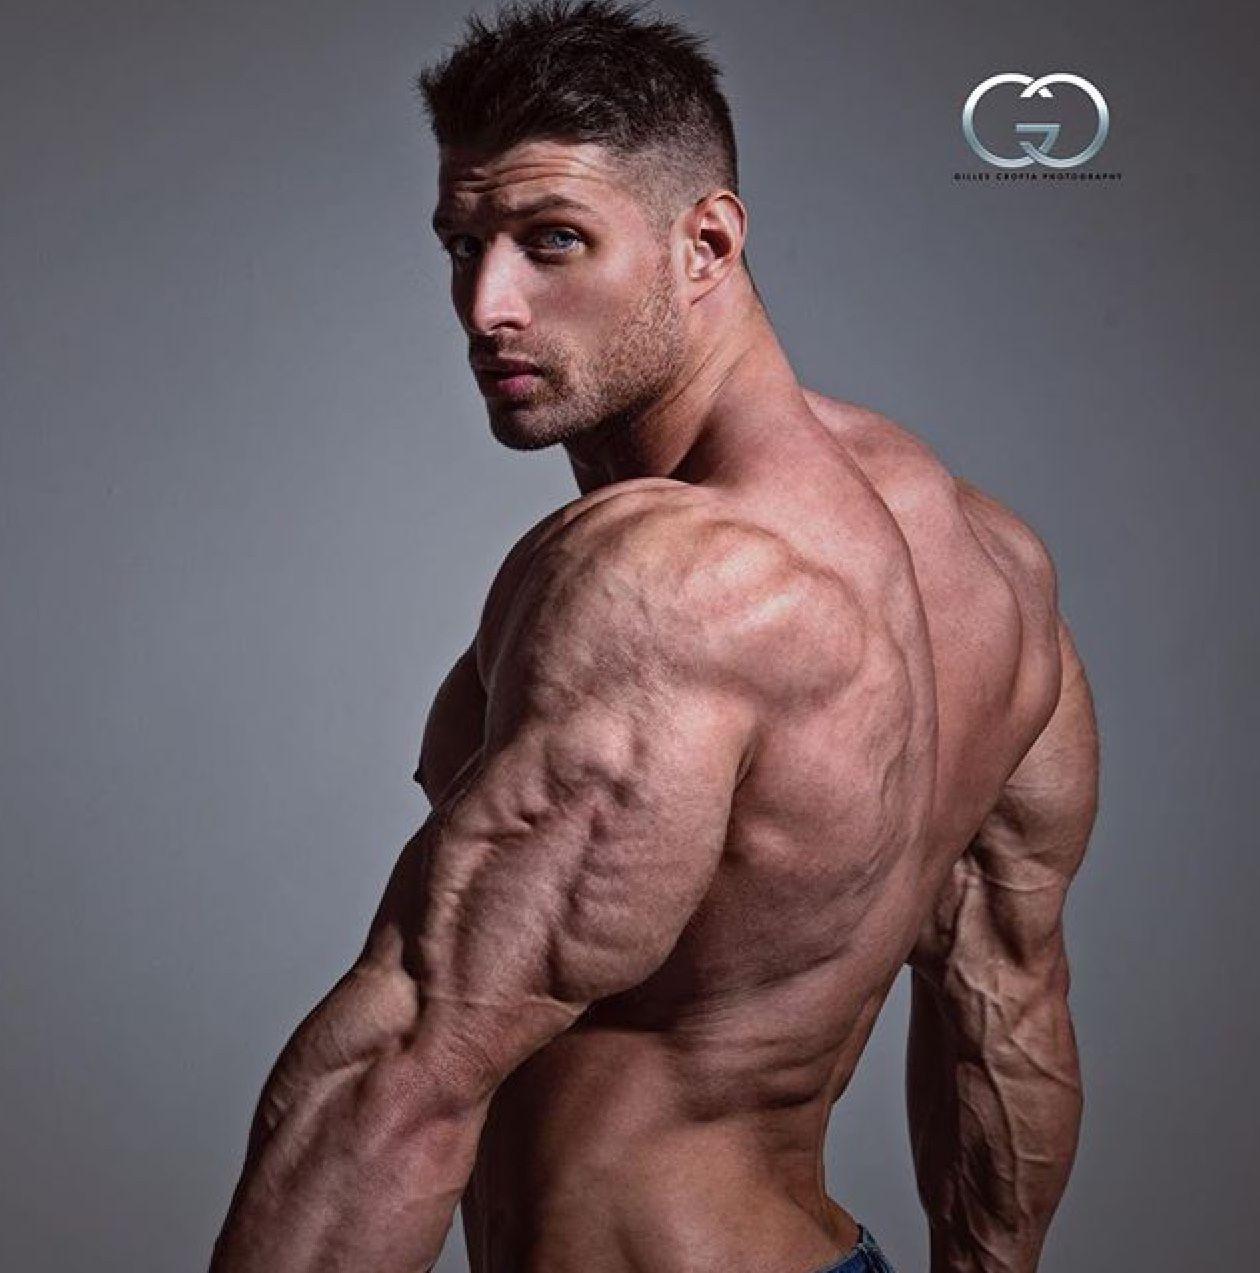 Muscle bodyworship